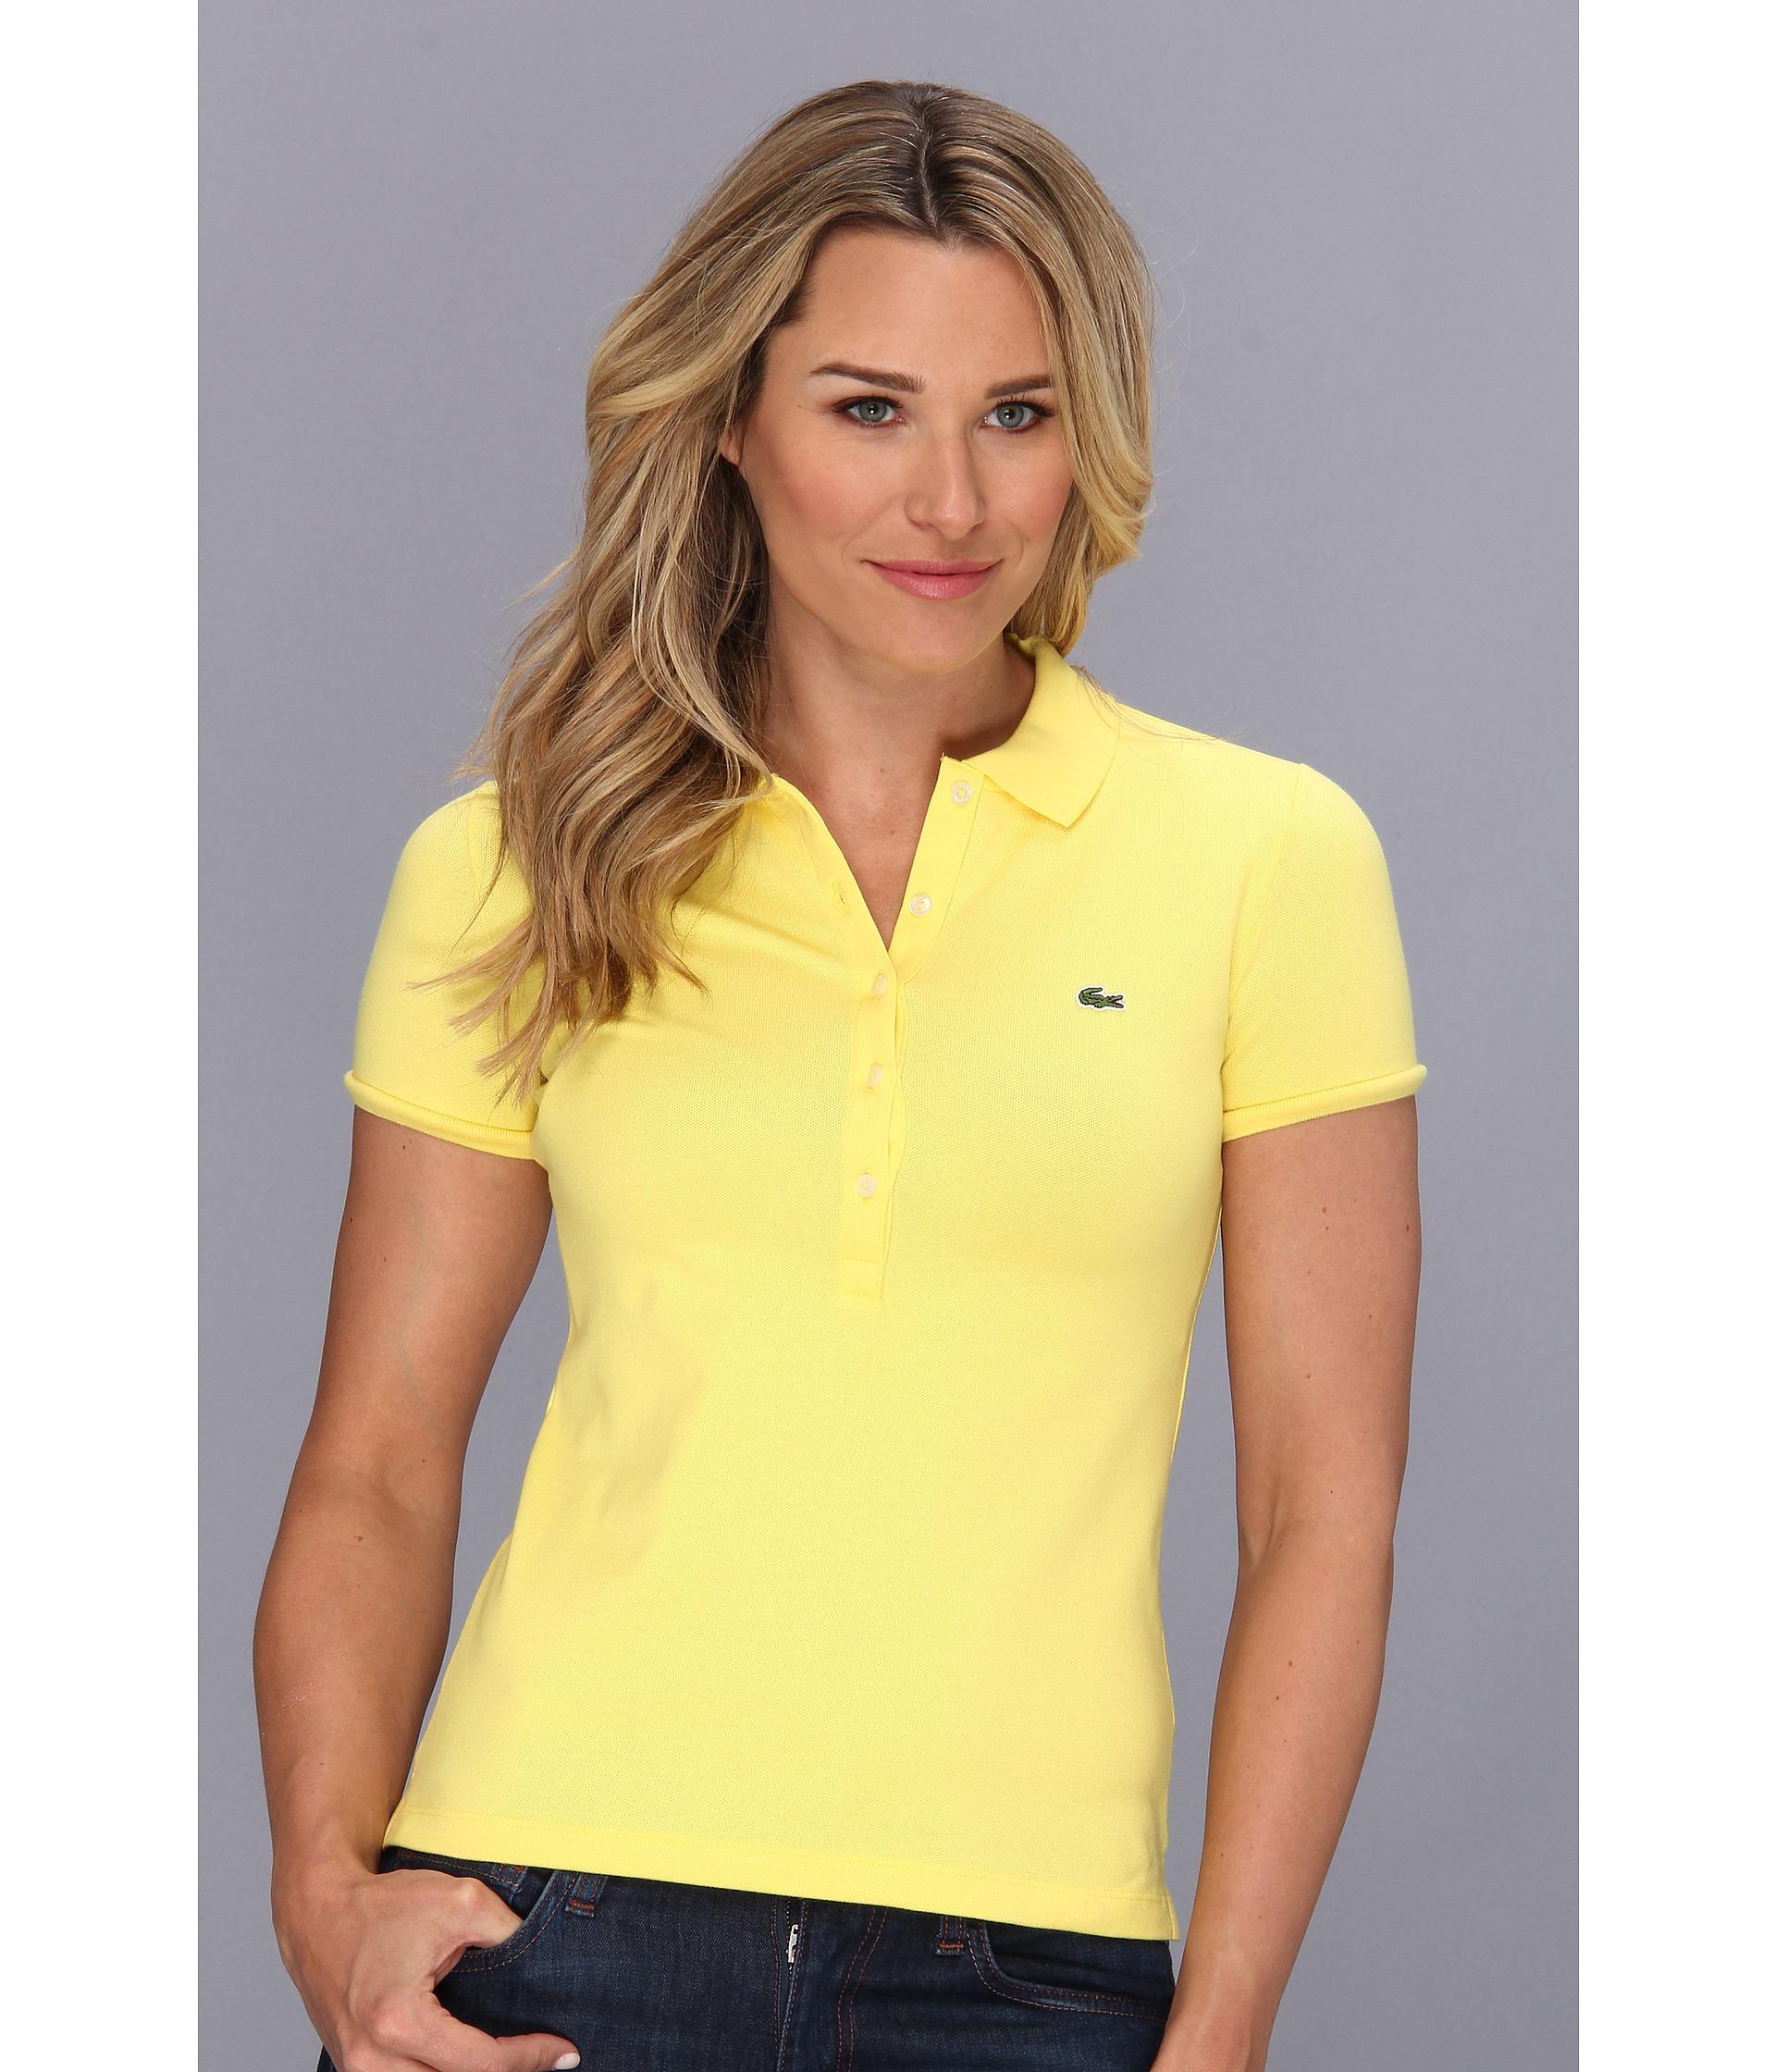 lacoste women's polo shirts uk, OFF 78%,Buy!